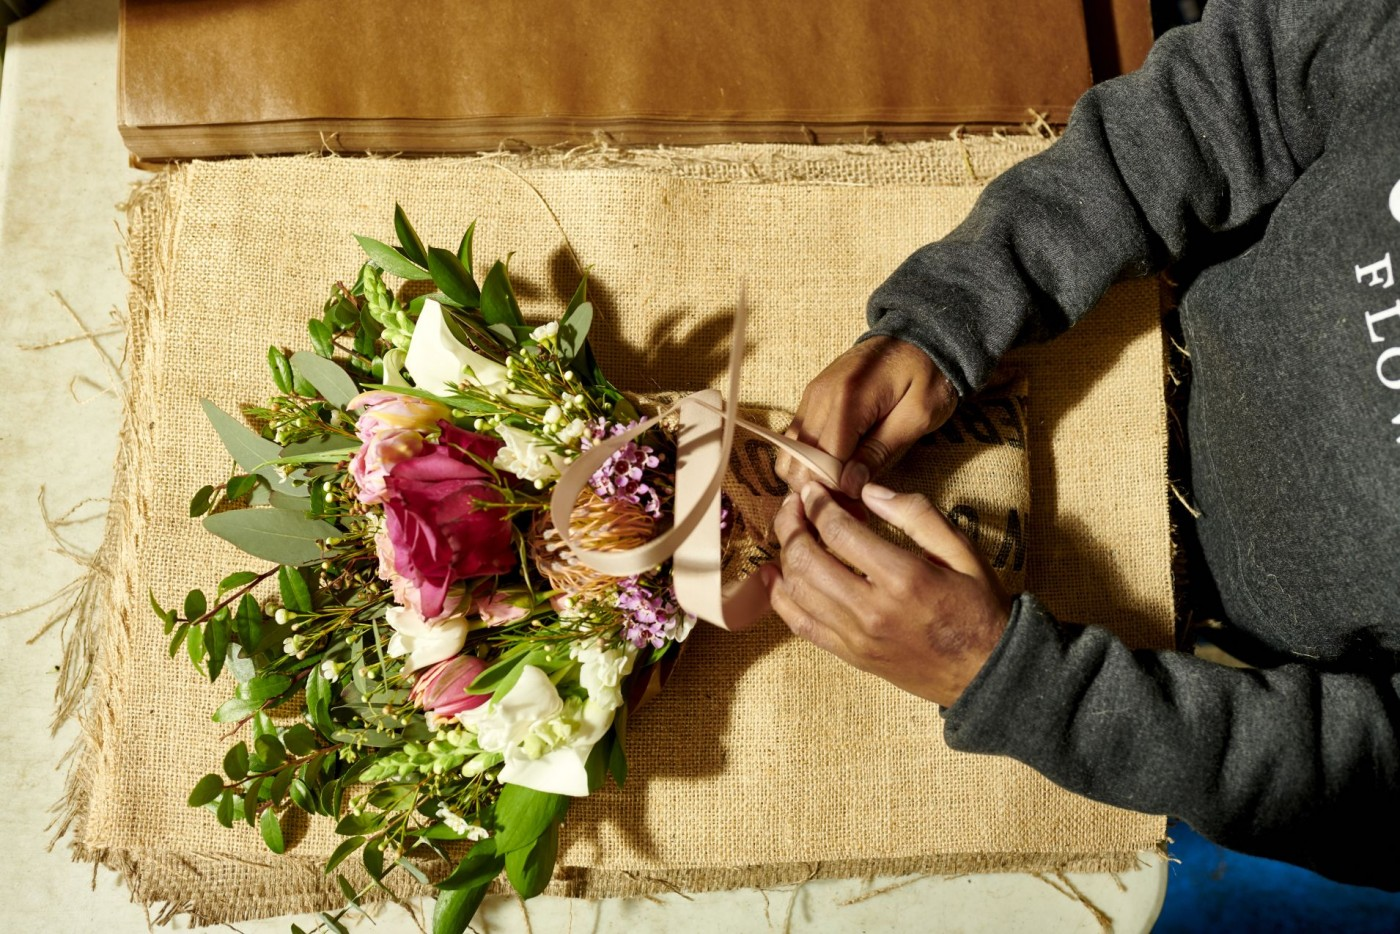 farmgirl-flower-ceo2.jpg